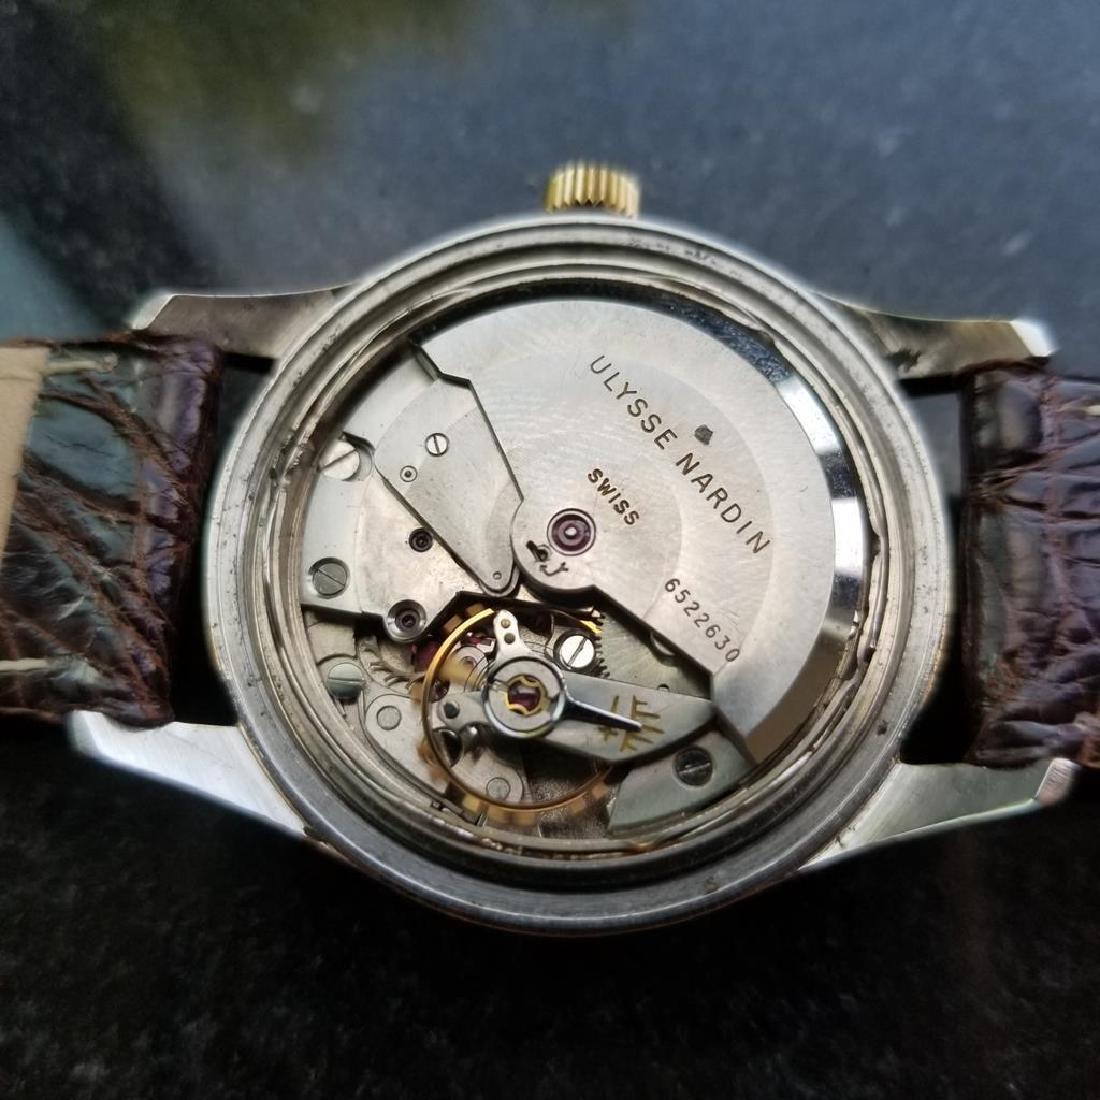 Vintage ULYSSE NARDIN Chronometer Automatic w/ date - 10